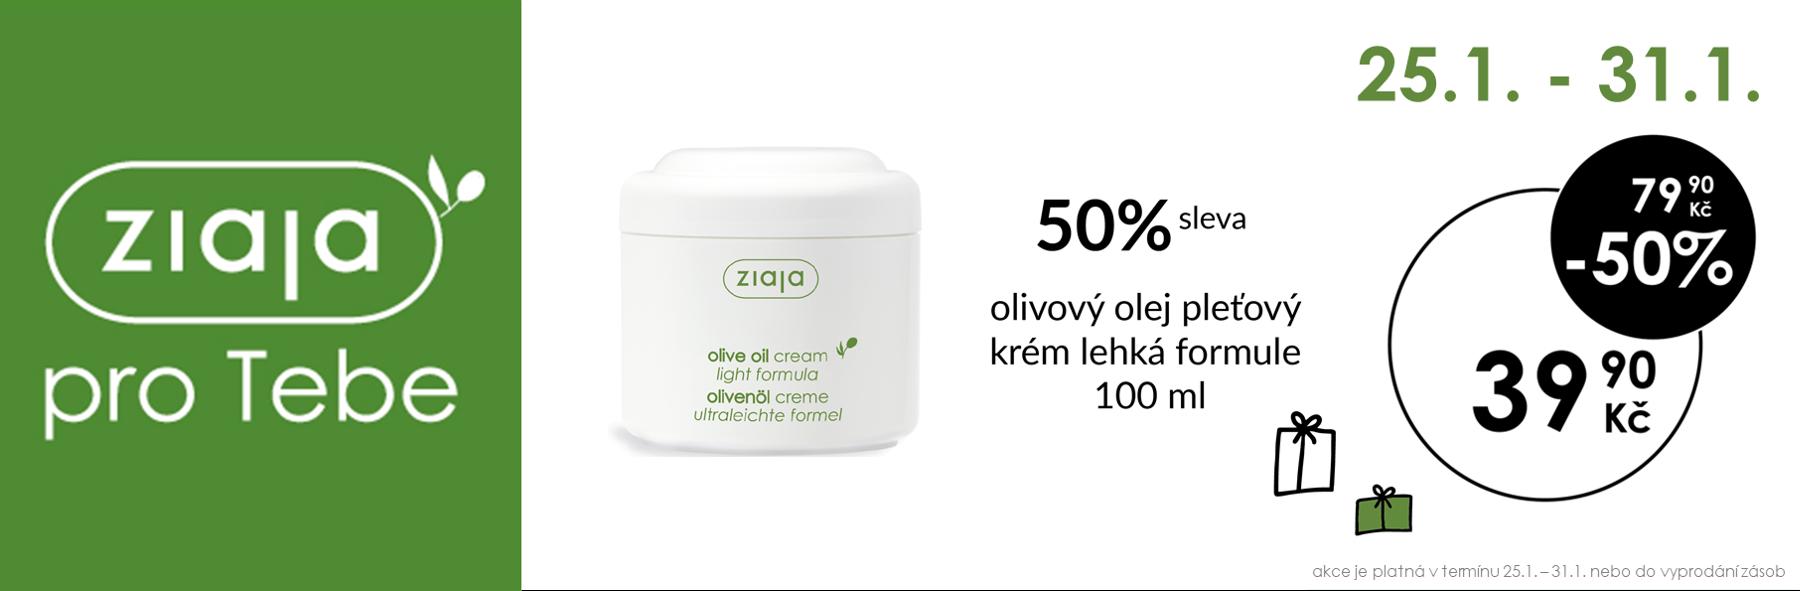 OlivOKrLight-50%